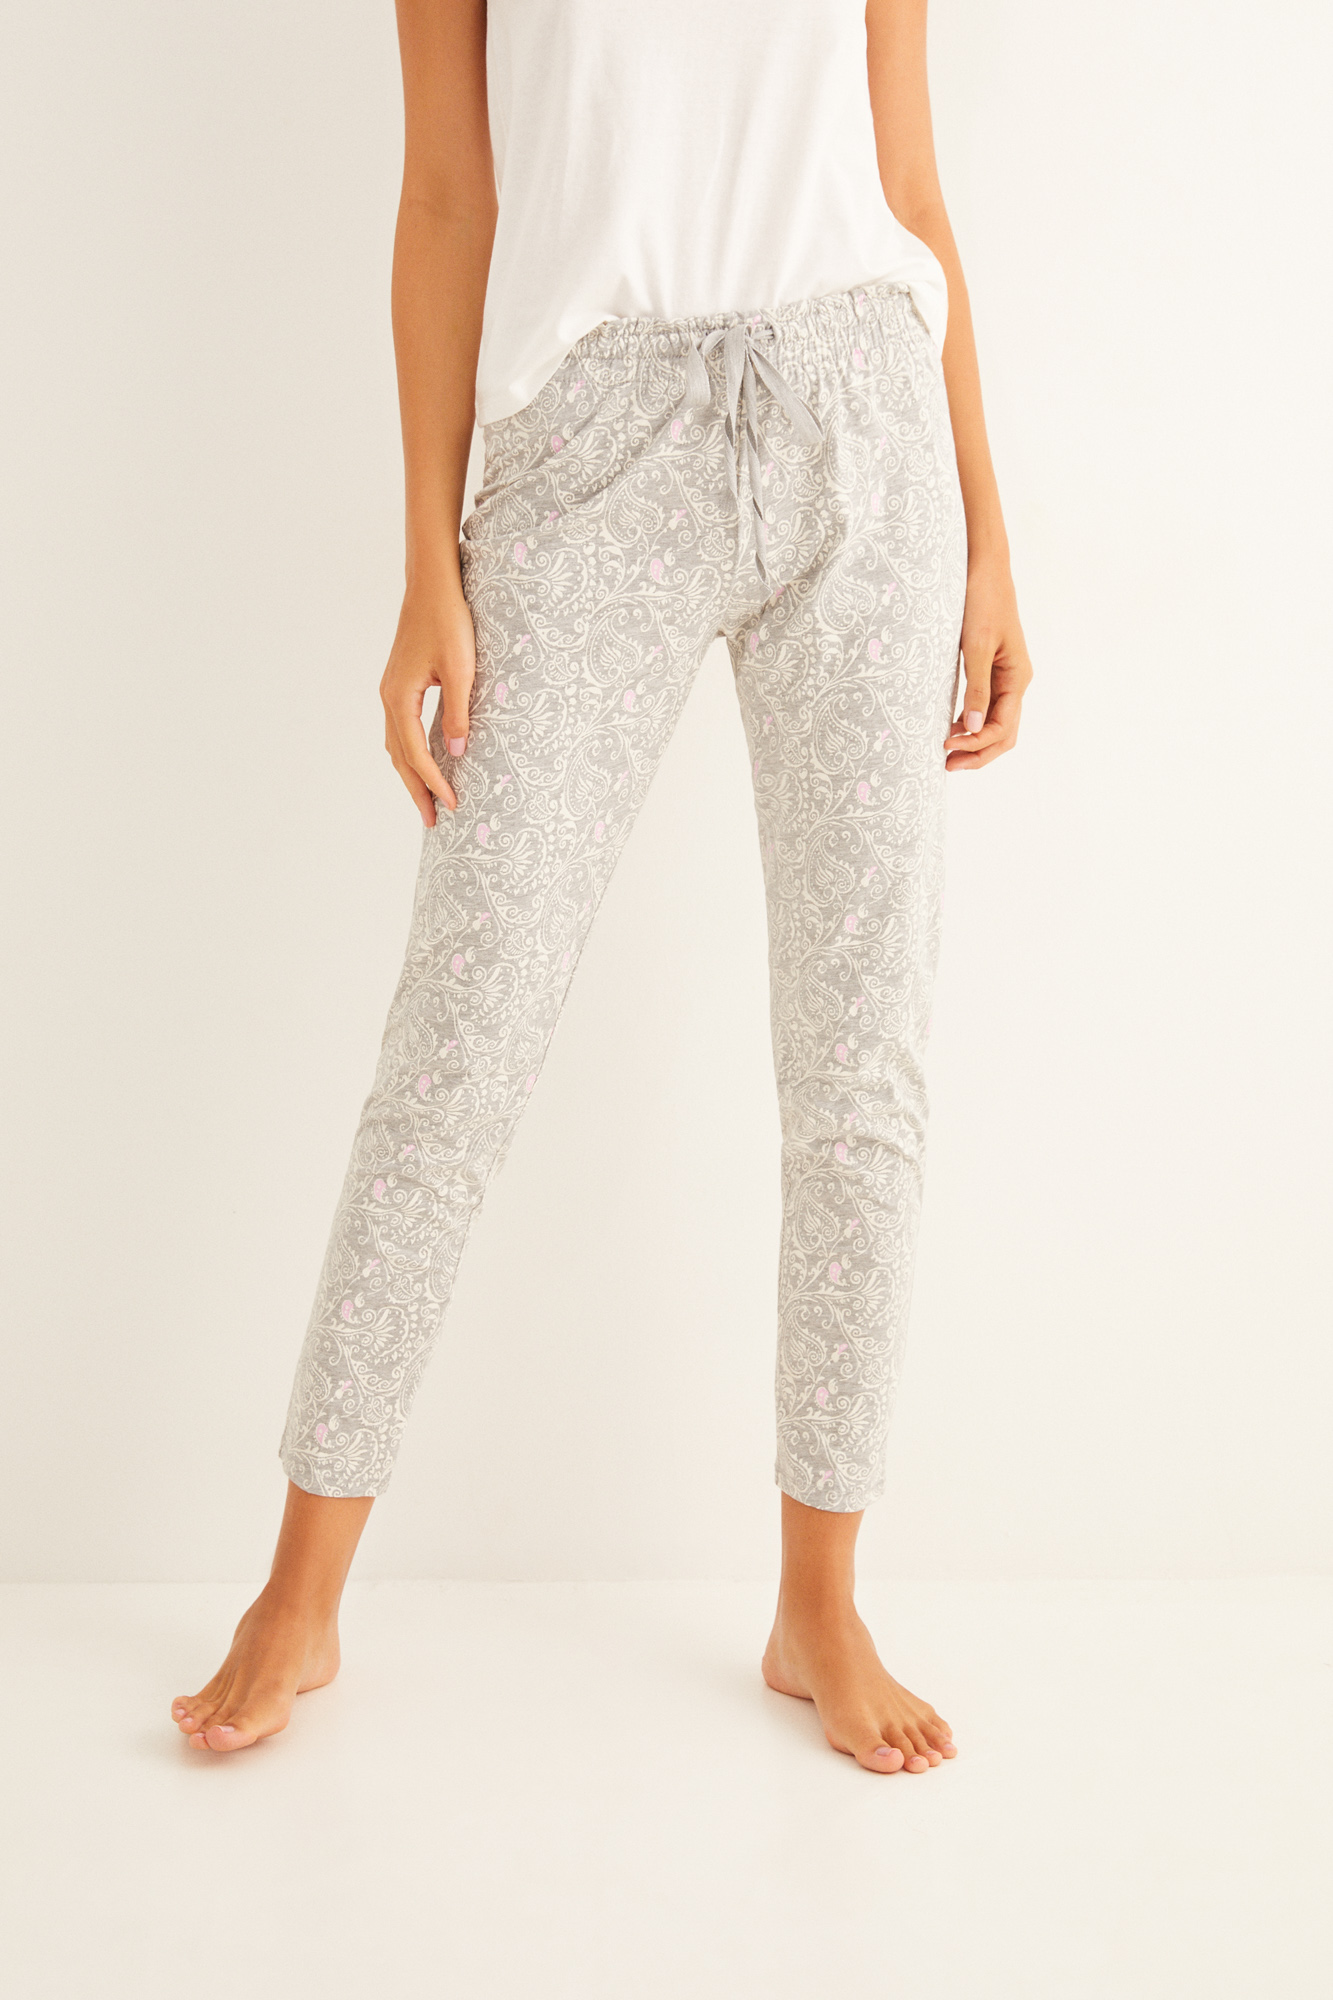 Pantalón largo de pijama estampado gris